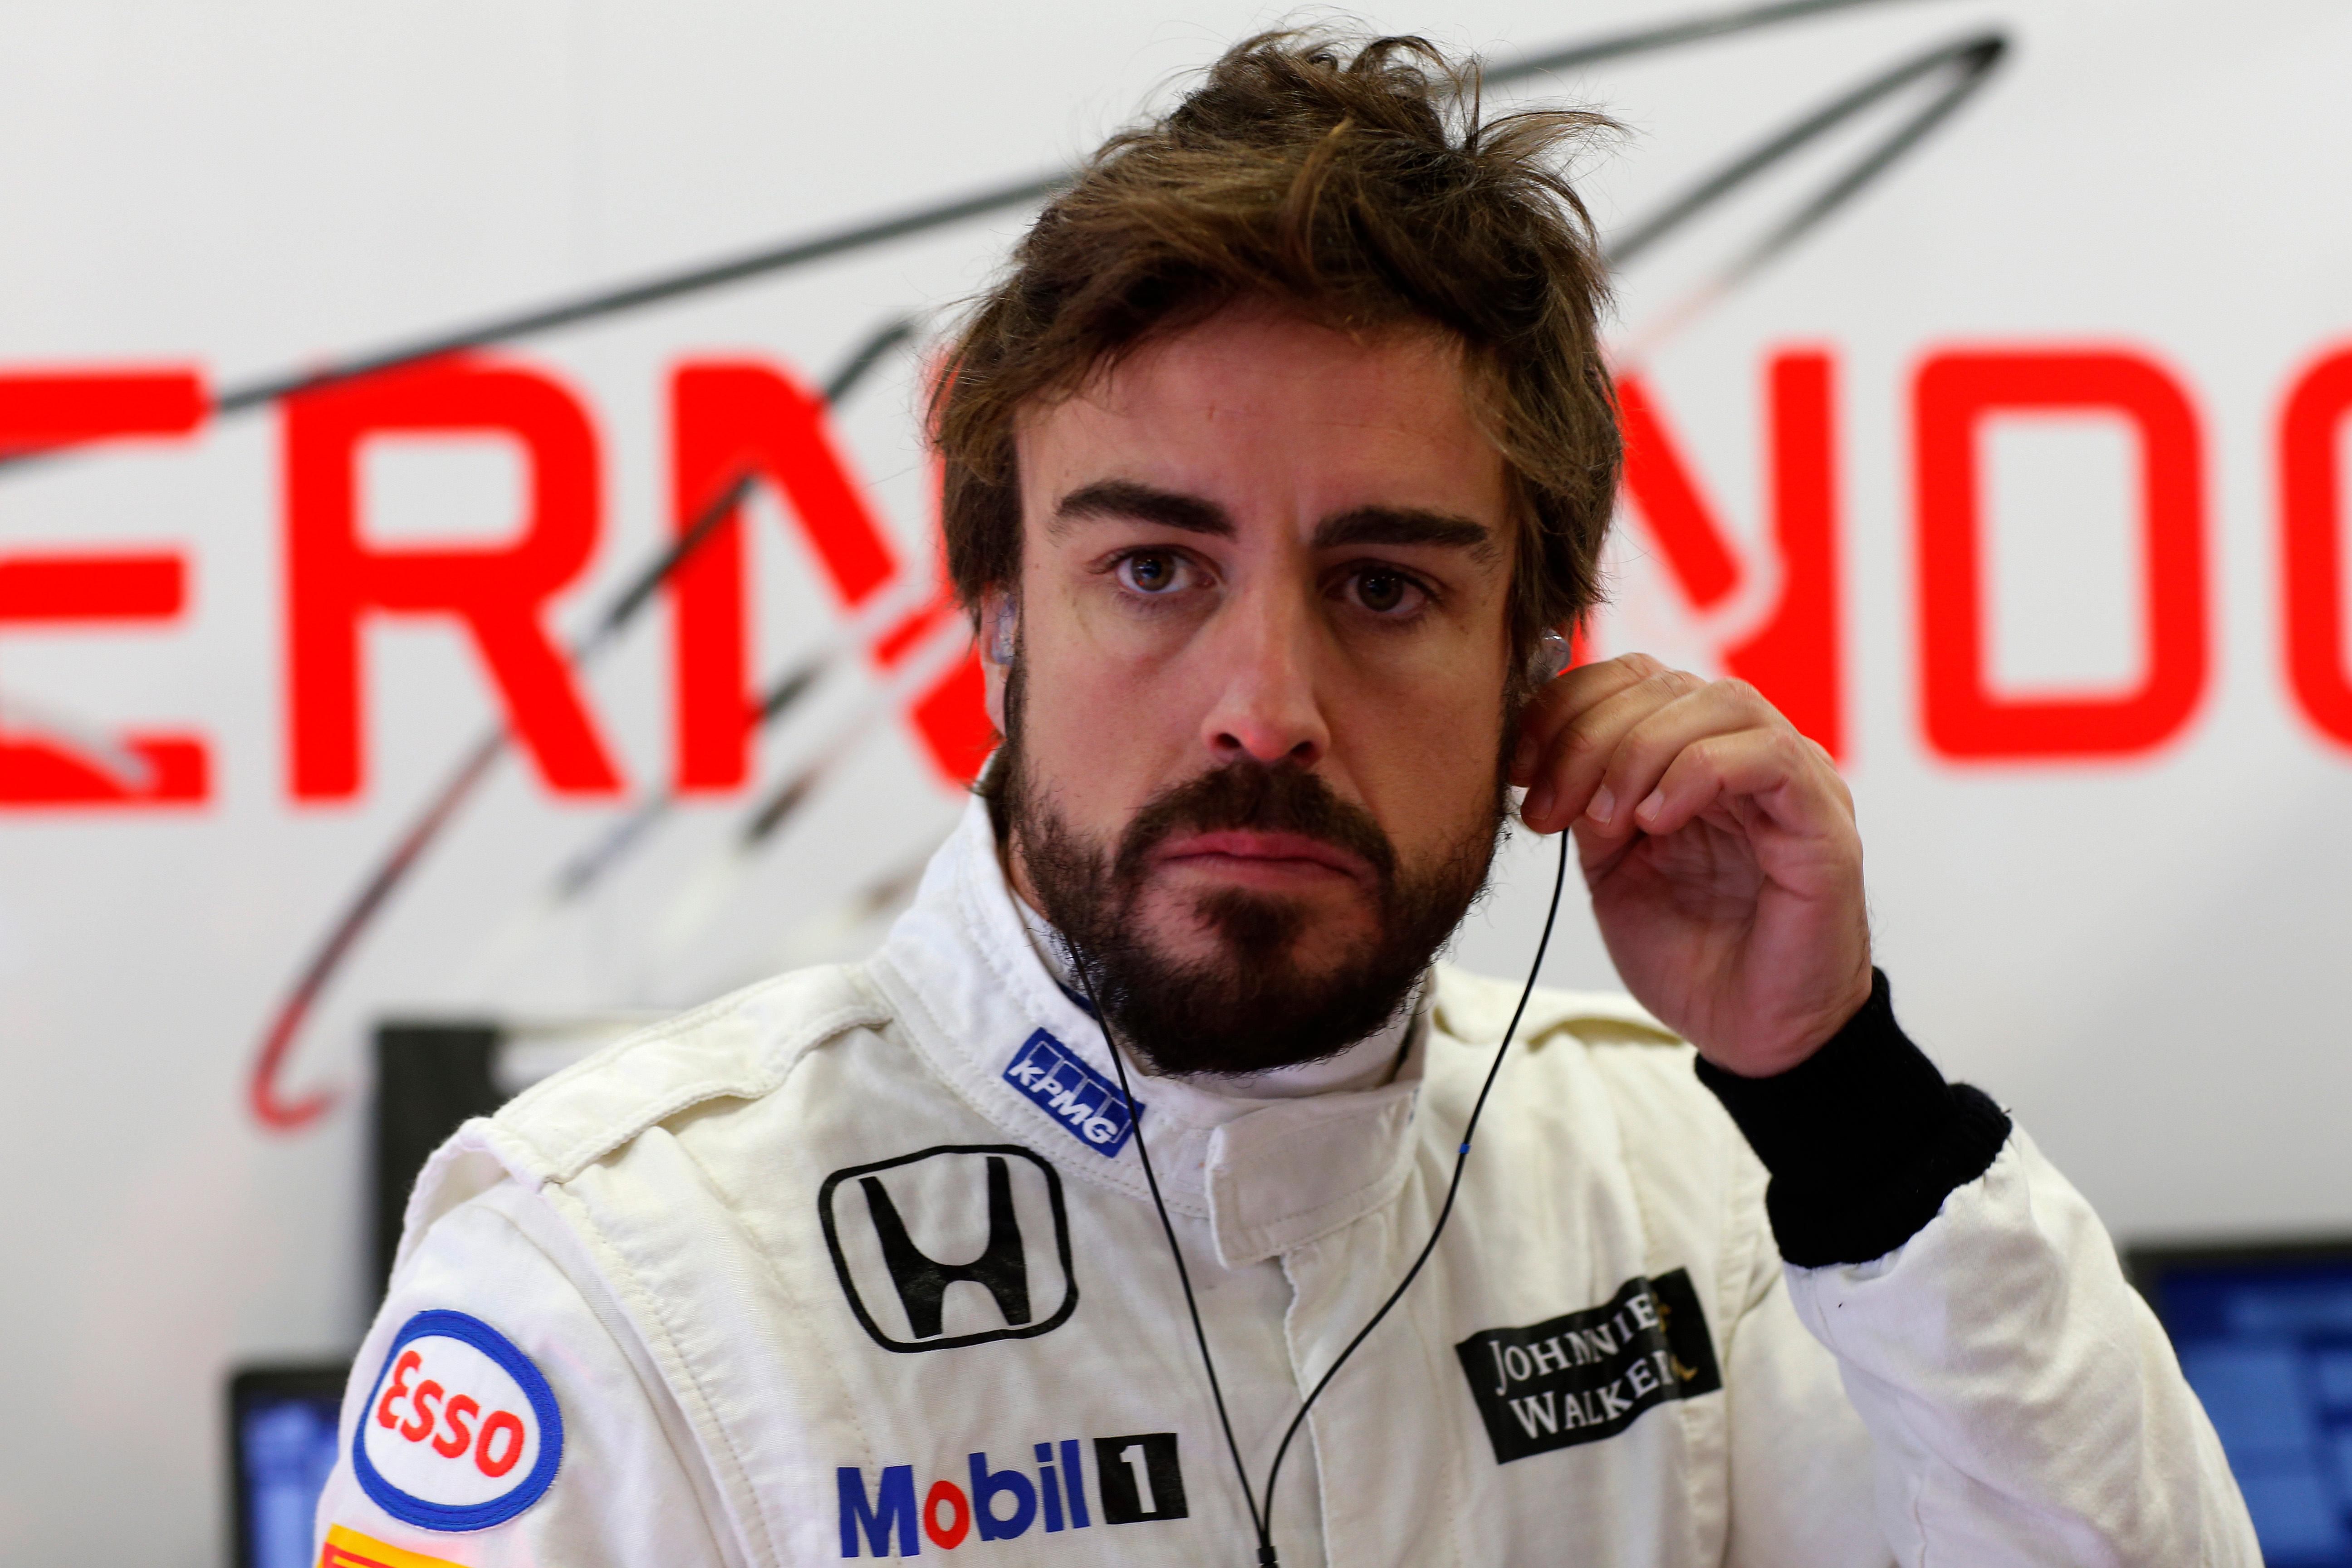 Alonso sempre al top per appeal commerciale